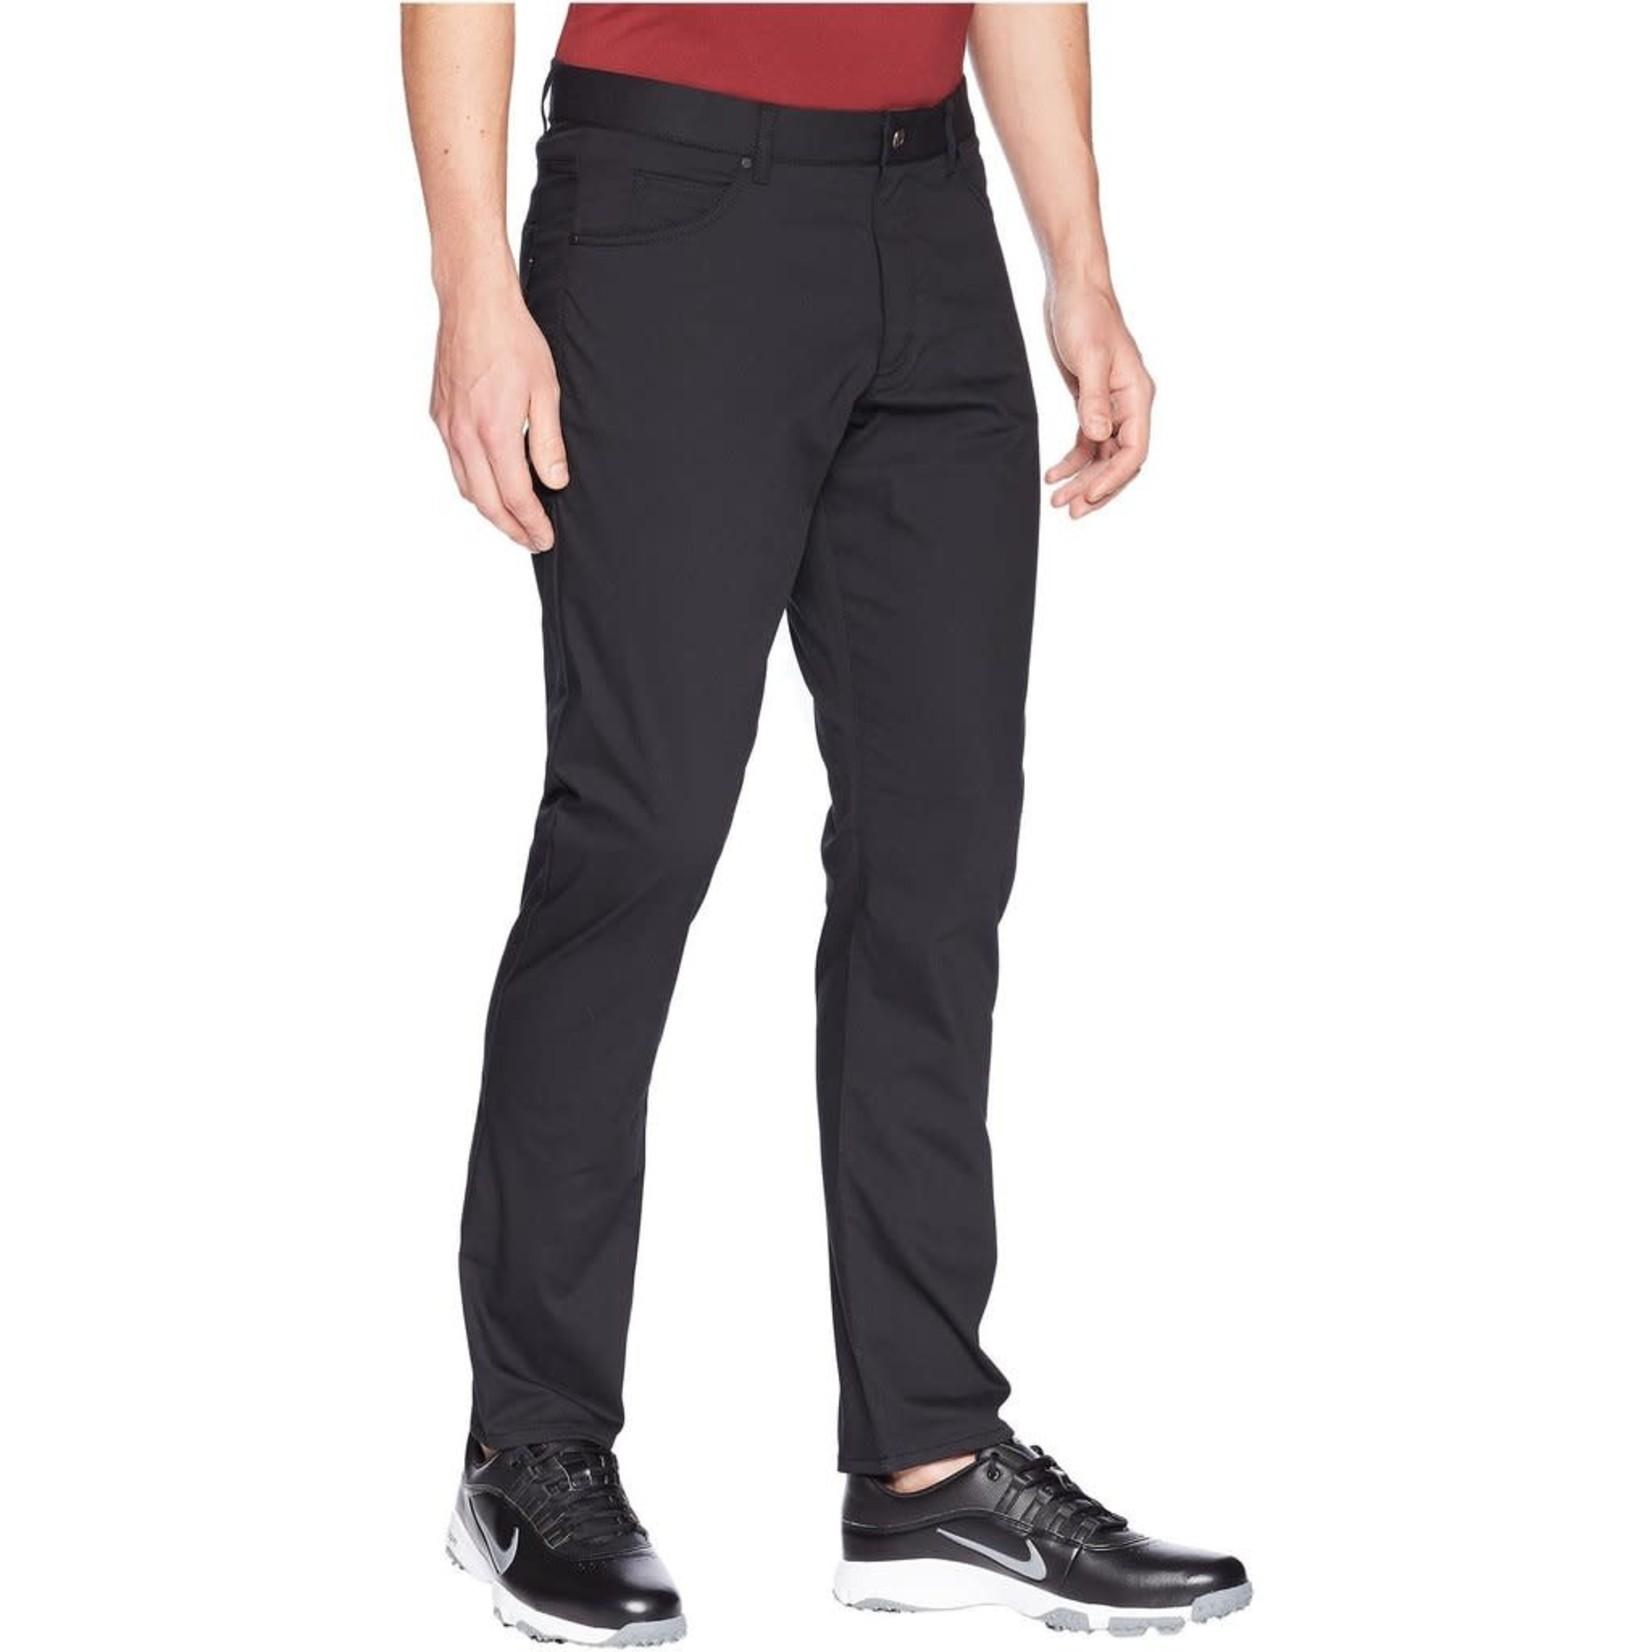 Nike Nike Pants, Flex 5 Pocket Slim, Mens